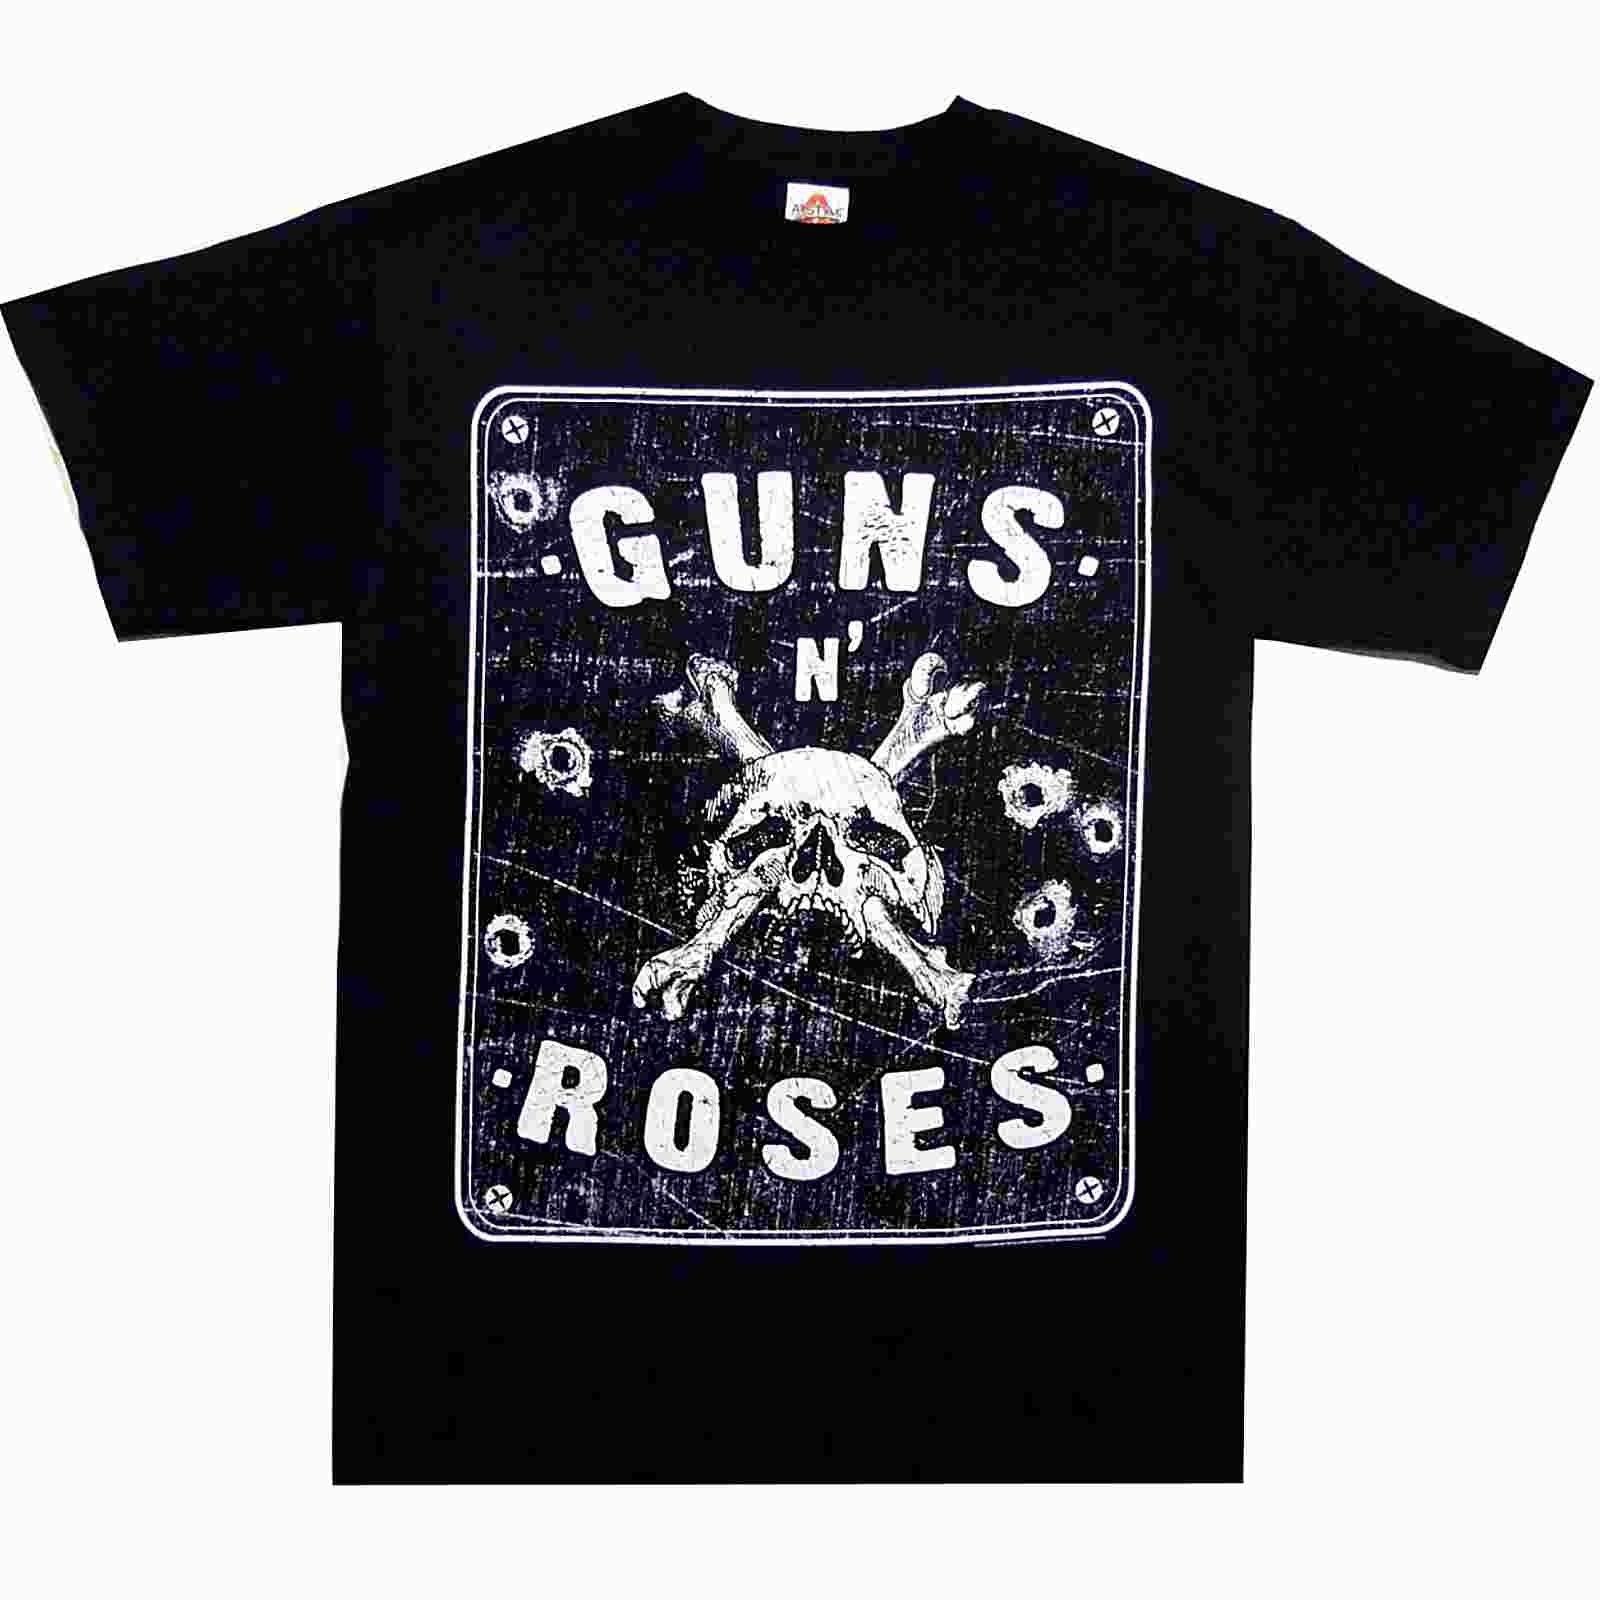 Guns N Roses Street Sign S M L XL Official T-Shirt Rock Band Tshirt New